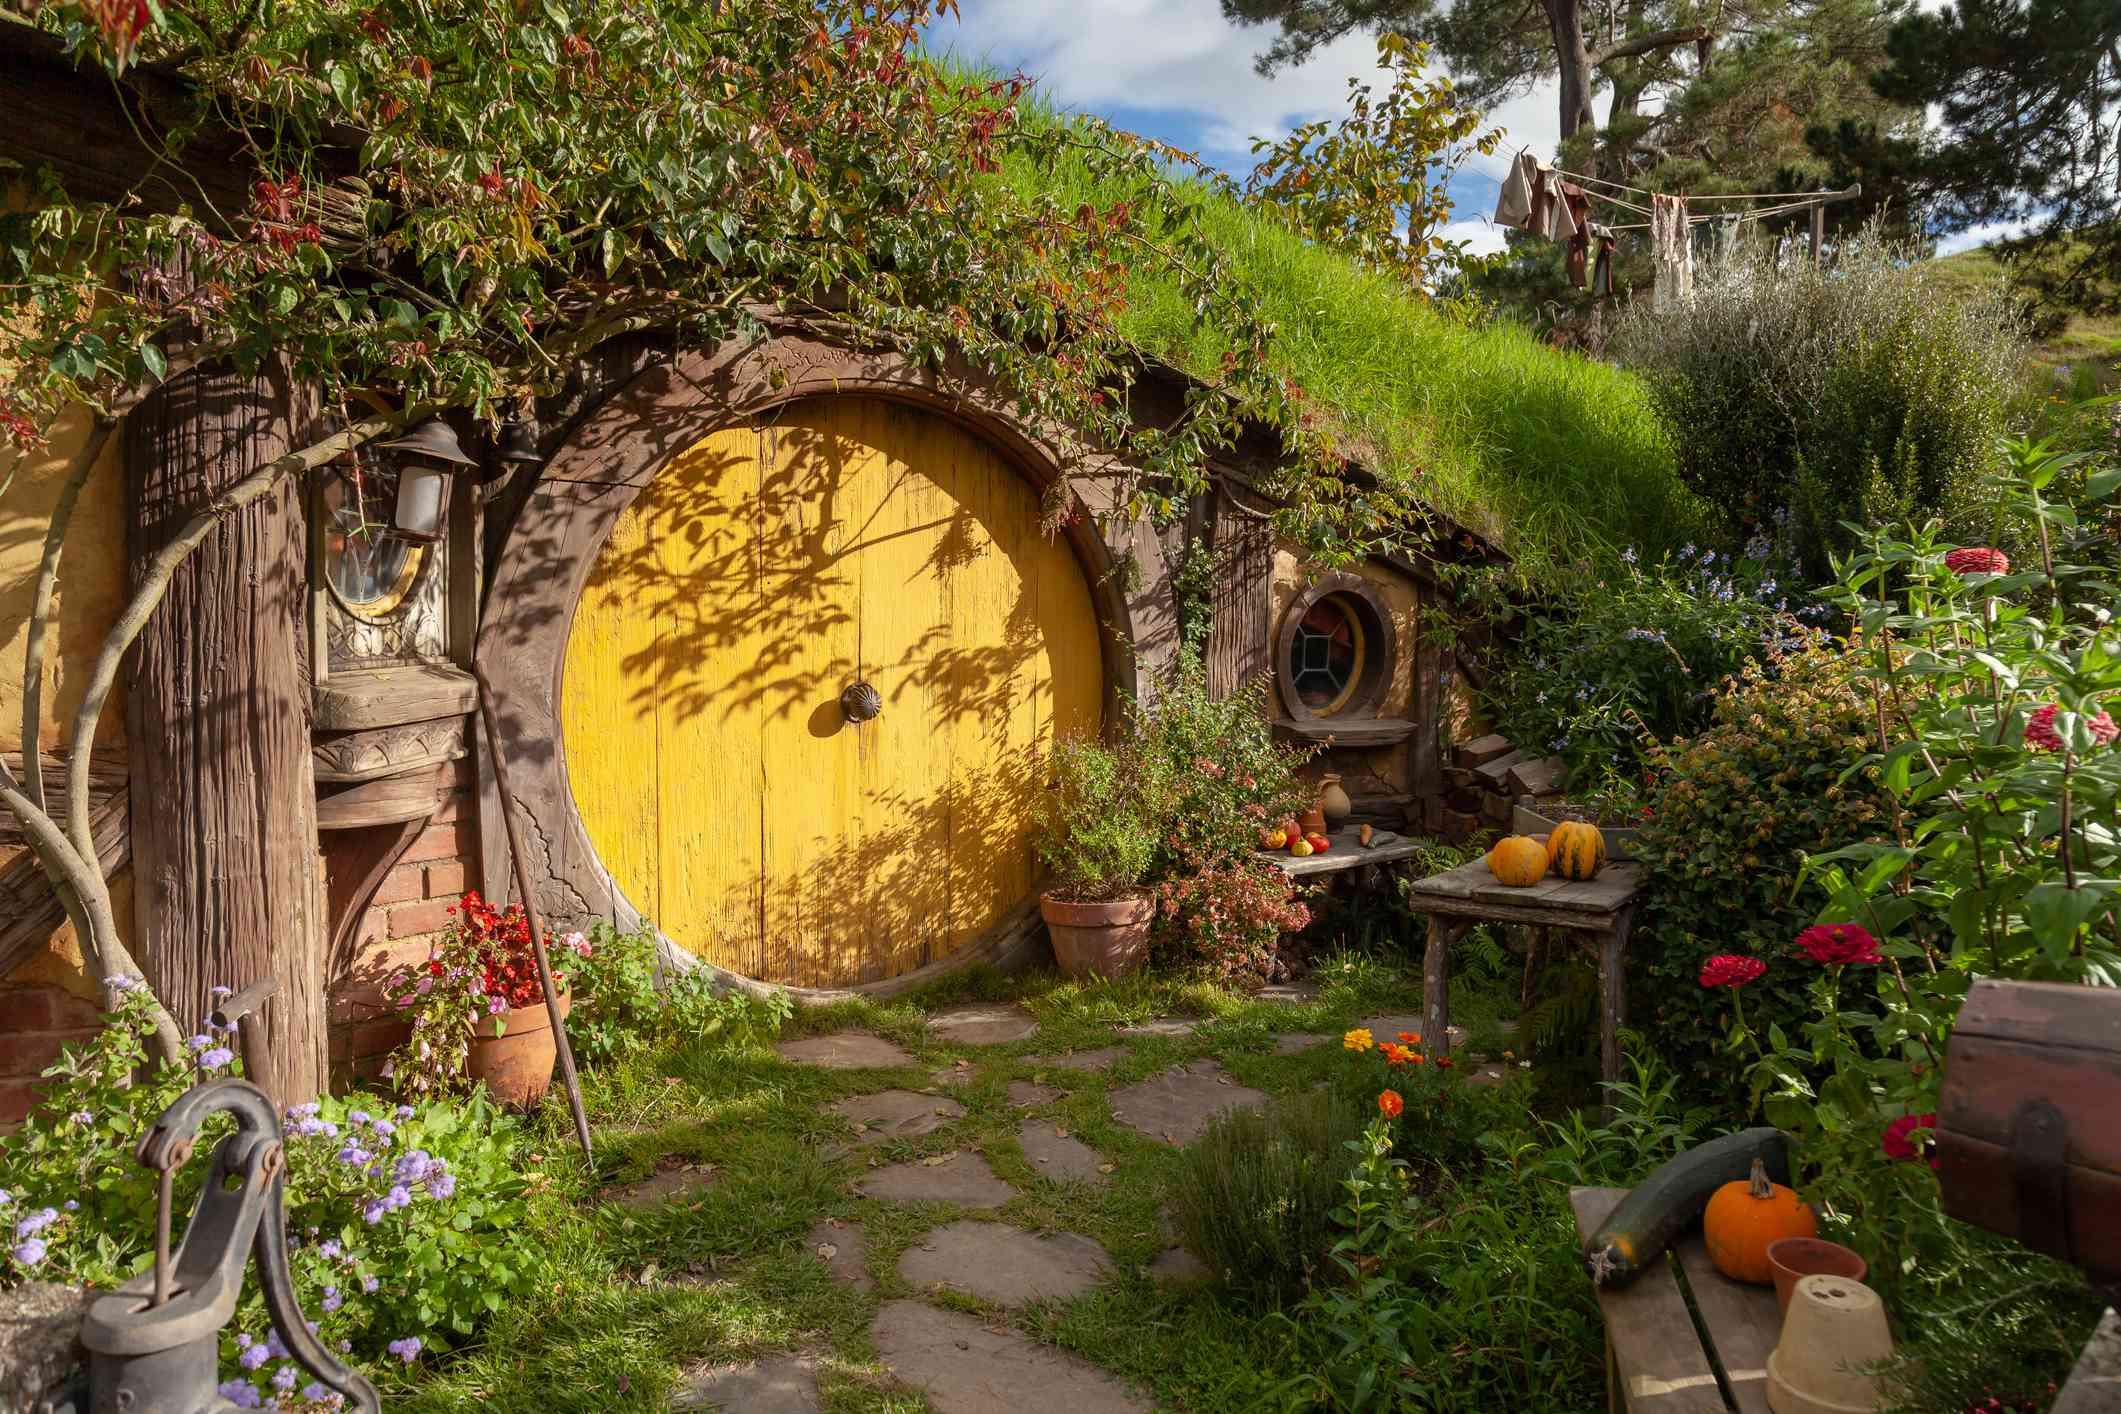 entrada a una casa Hobbit en Hobbiton